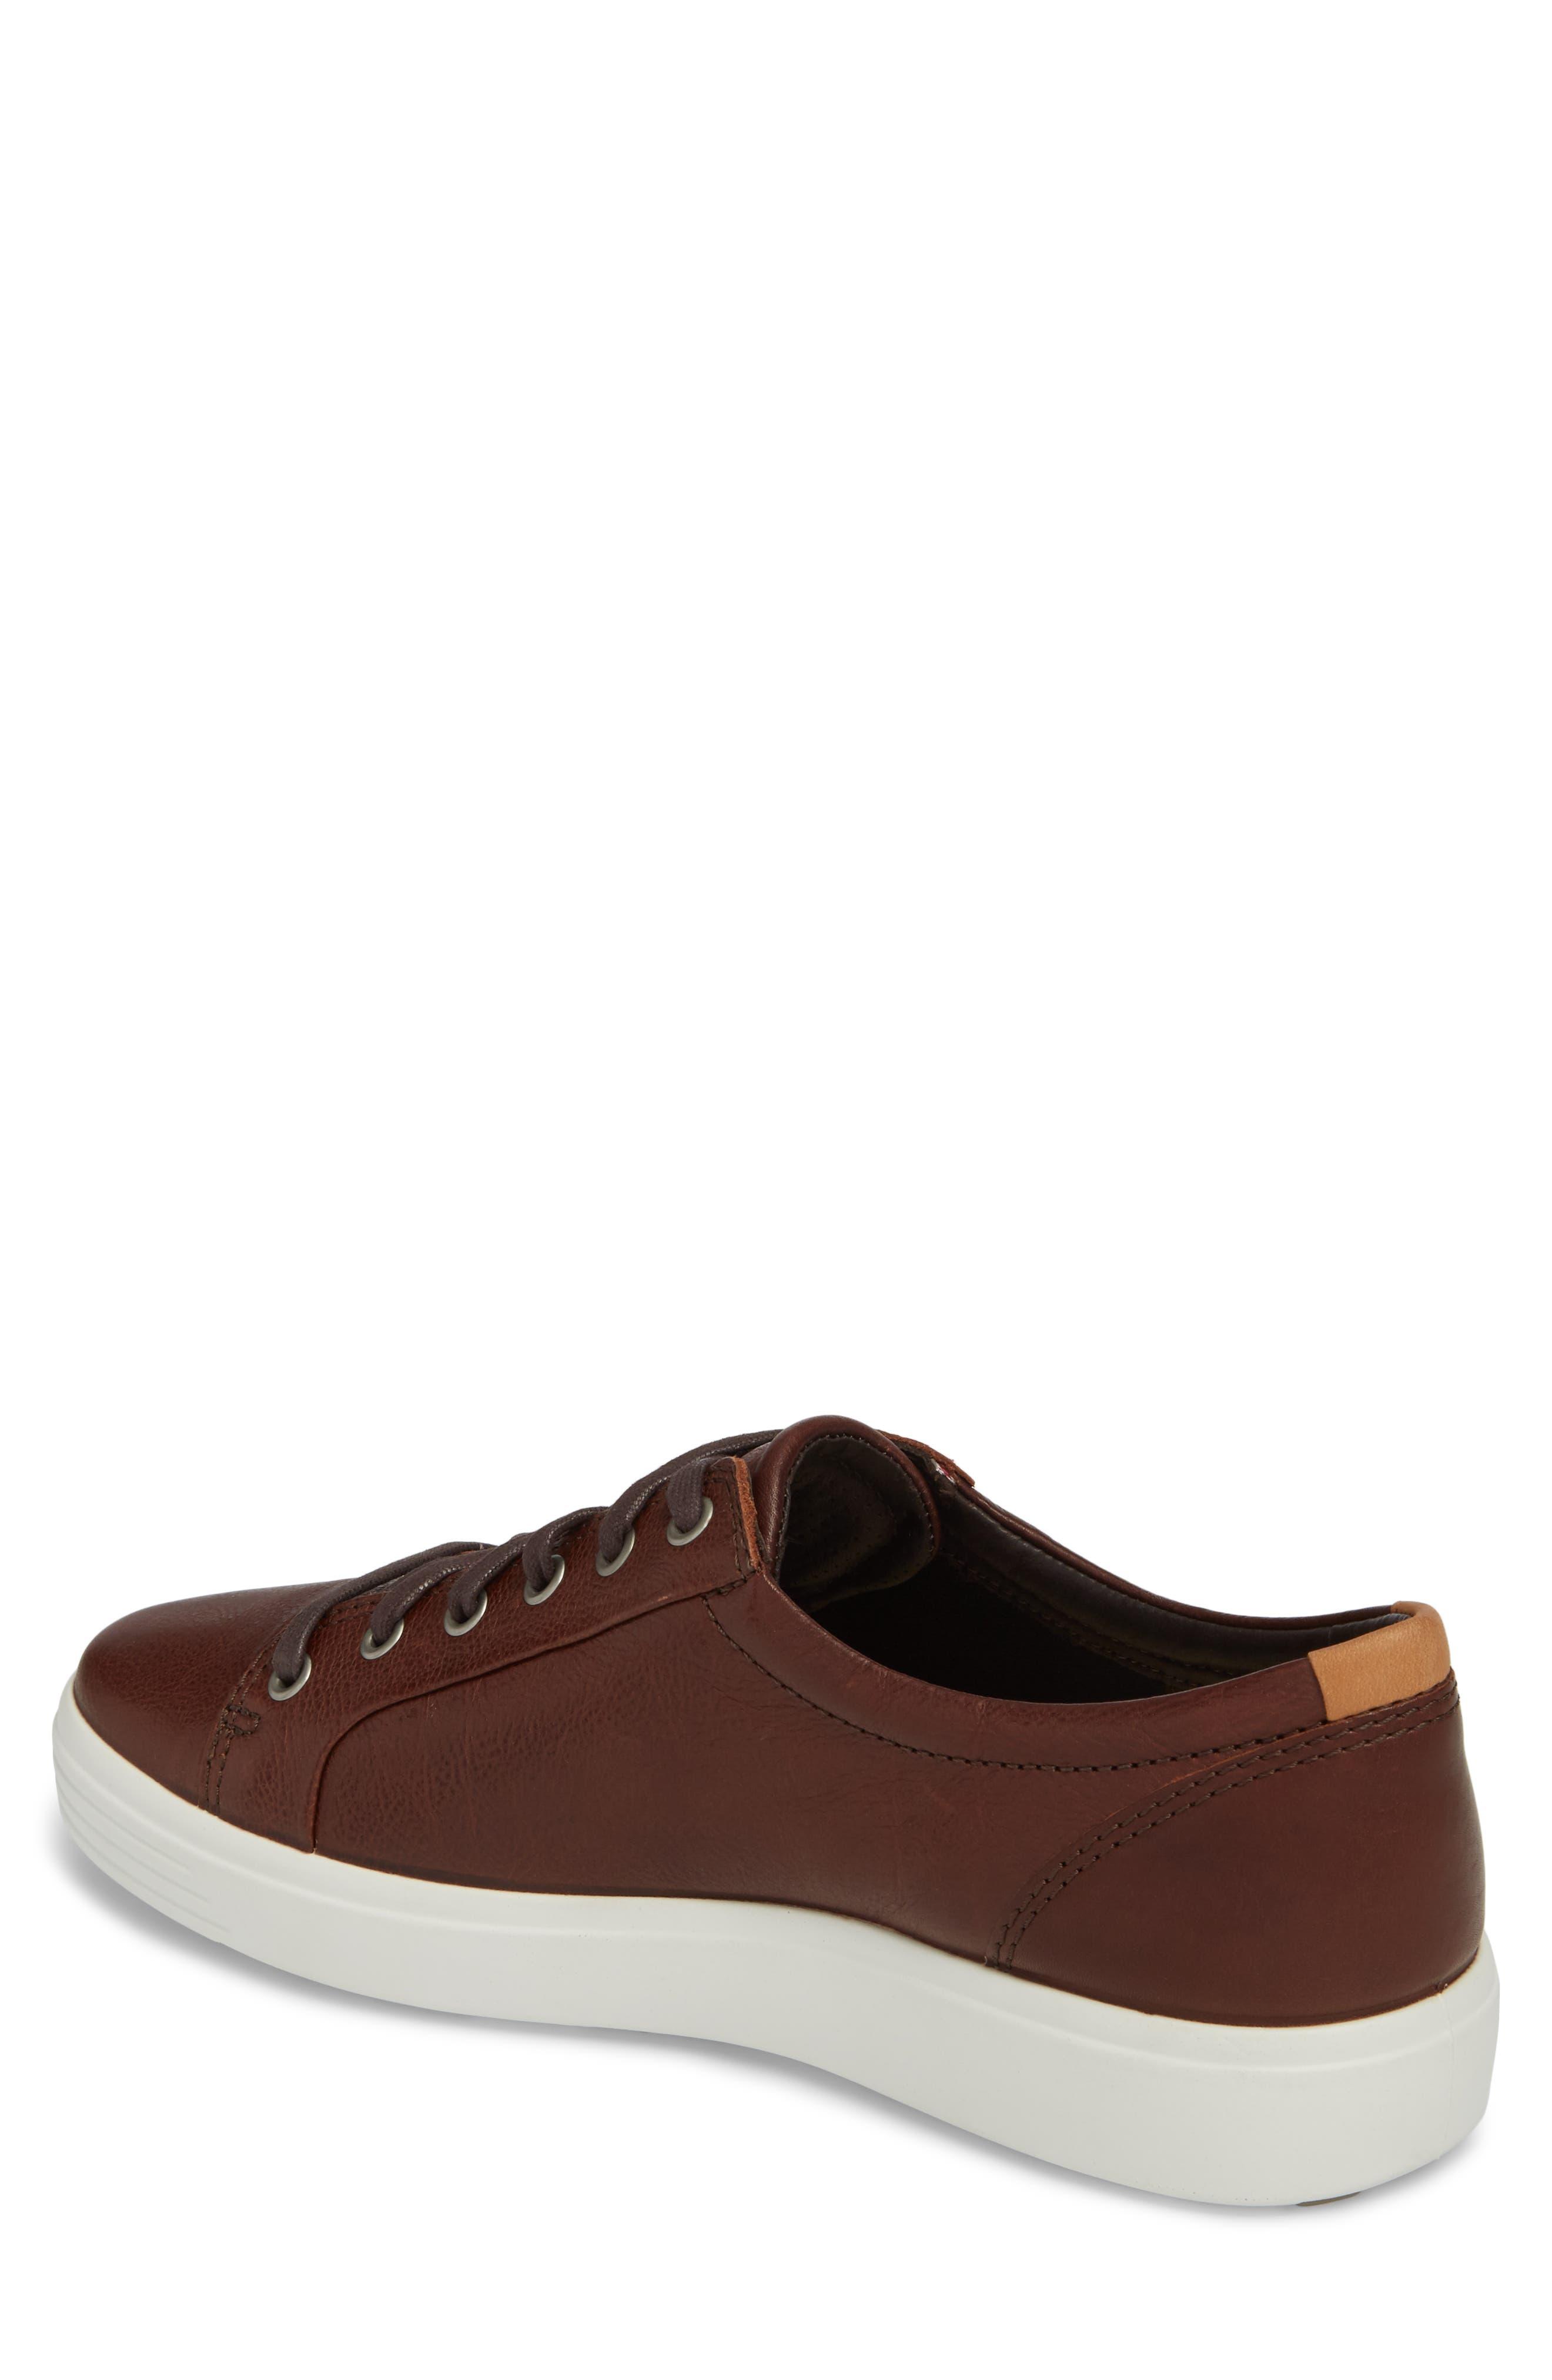 Alternate Image 2  - ECCOSoft VII Lace-Up Sneaker (Men)